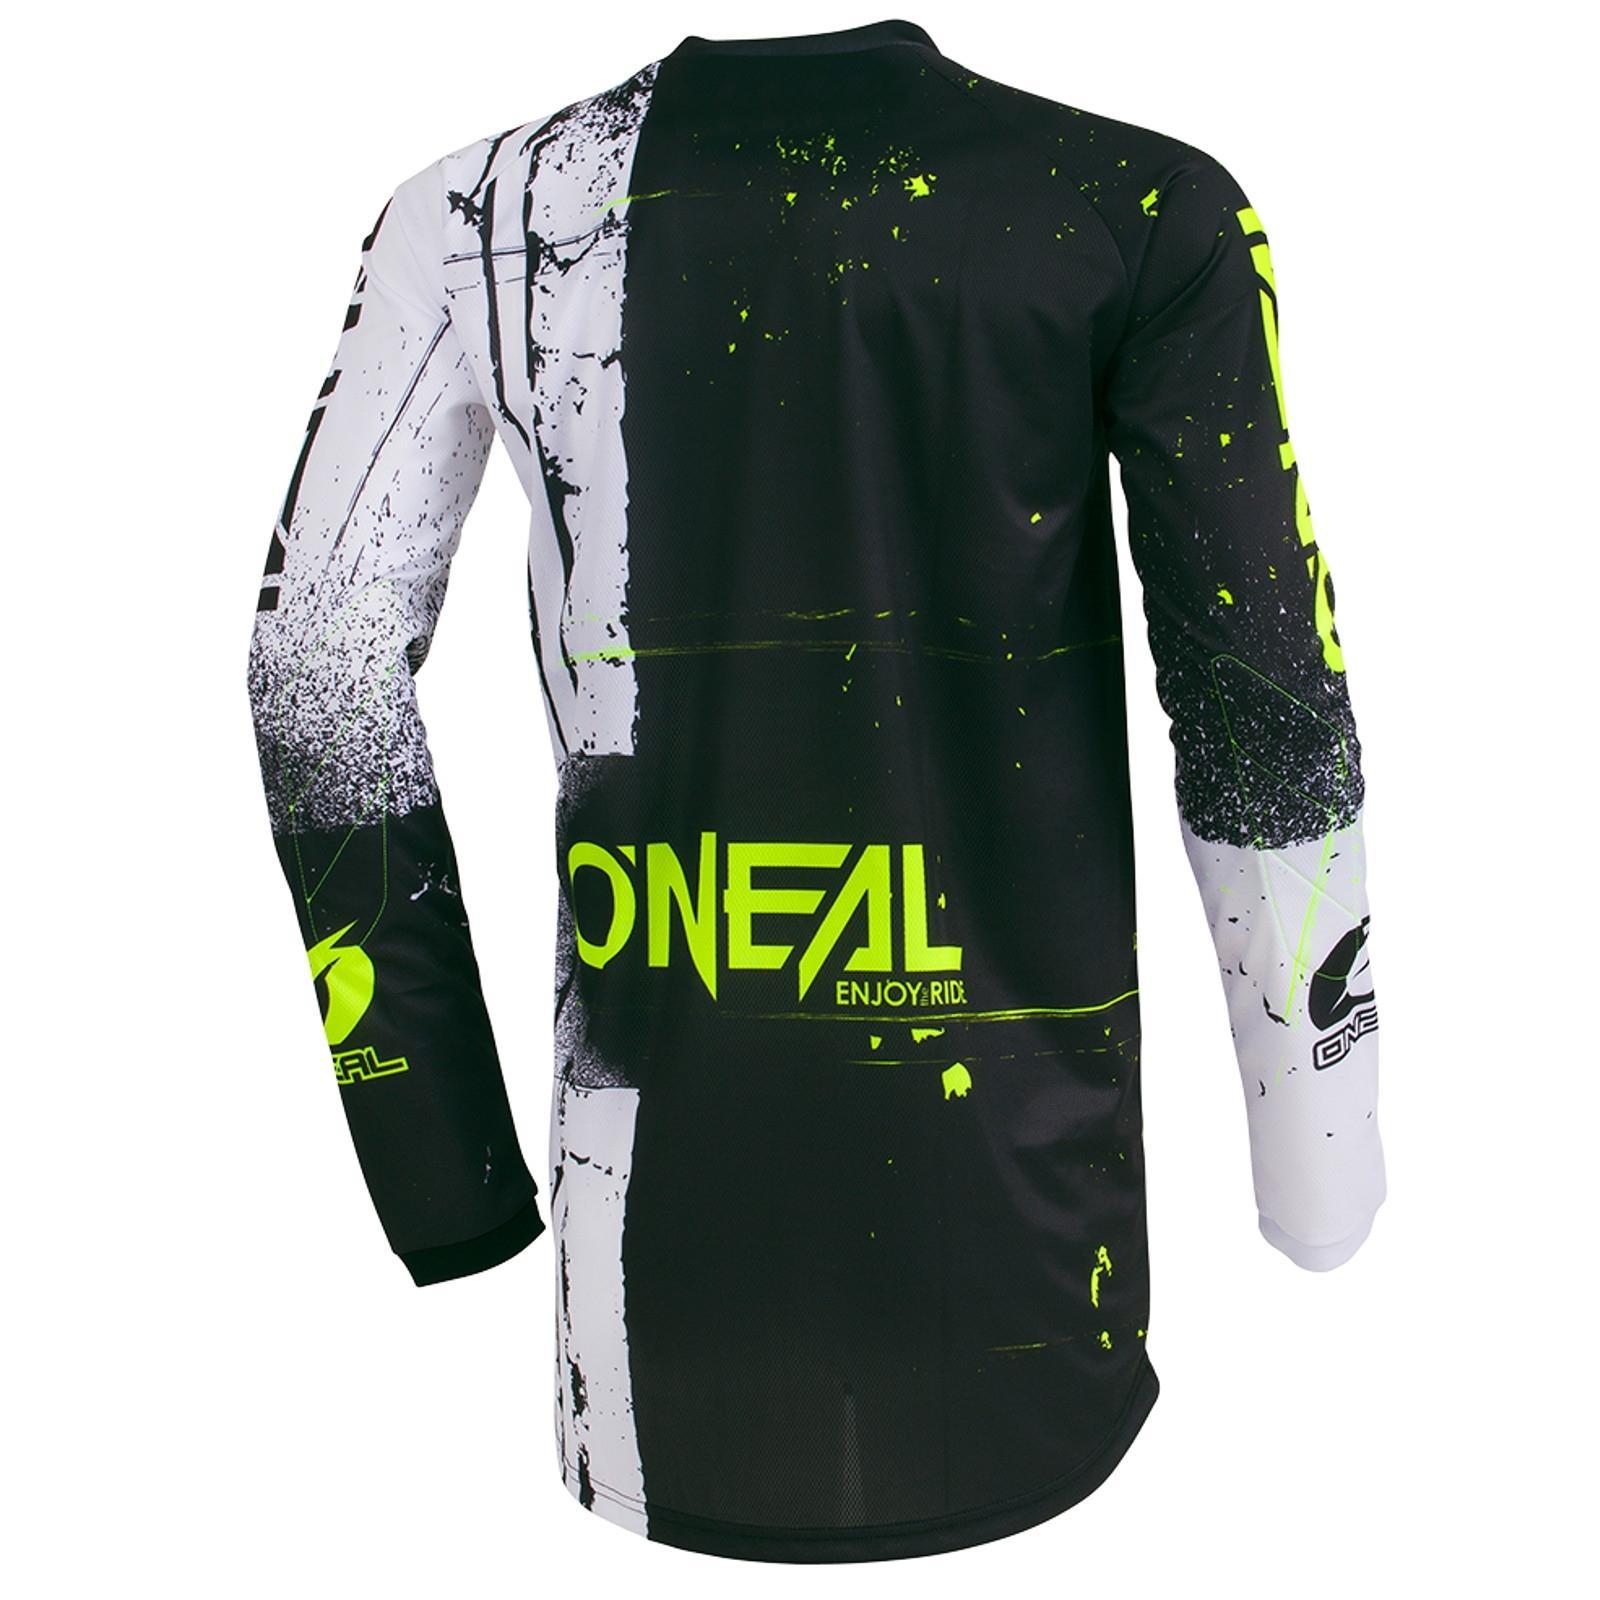 O-039-Neal-elemento-Mayhem-JERSEY-Racewear-Motocross-Maglia-MX-DH-FR-MTB-MOUNTAIN-BIKE miniatura 38